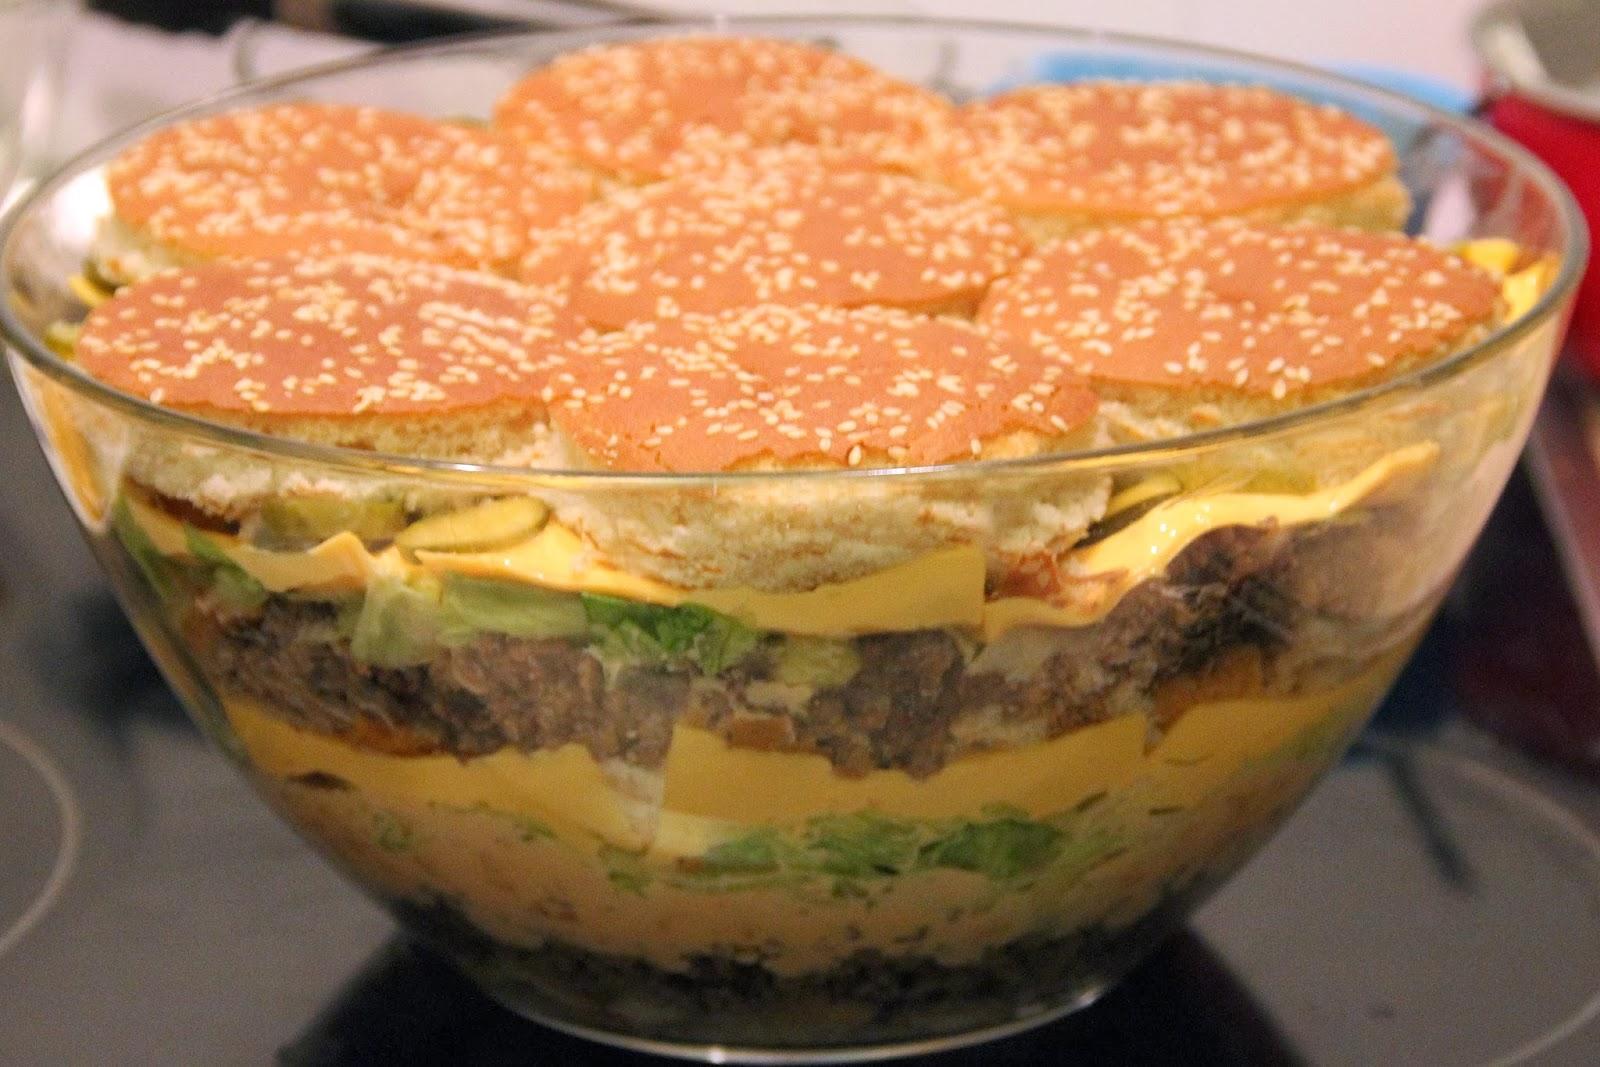 kochen backen randalieren bigmac salat oder schichtsalat ist nicht gleich schichtsalat. Black Bedroom Furniture Sets. Home Design Ideas